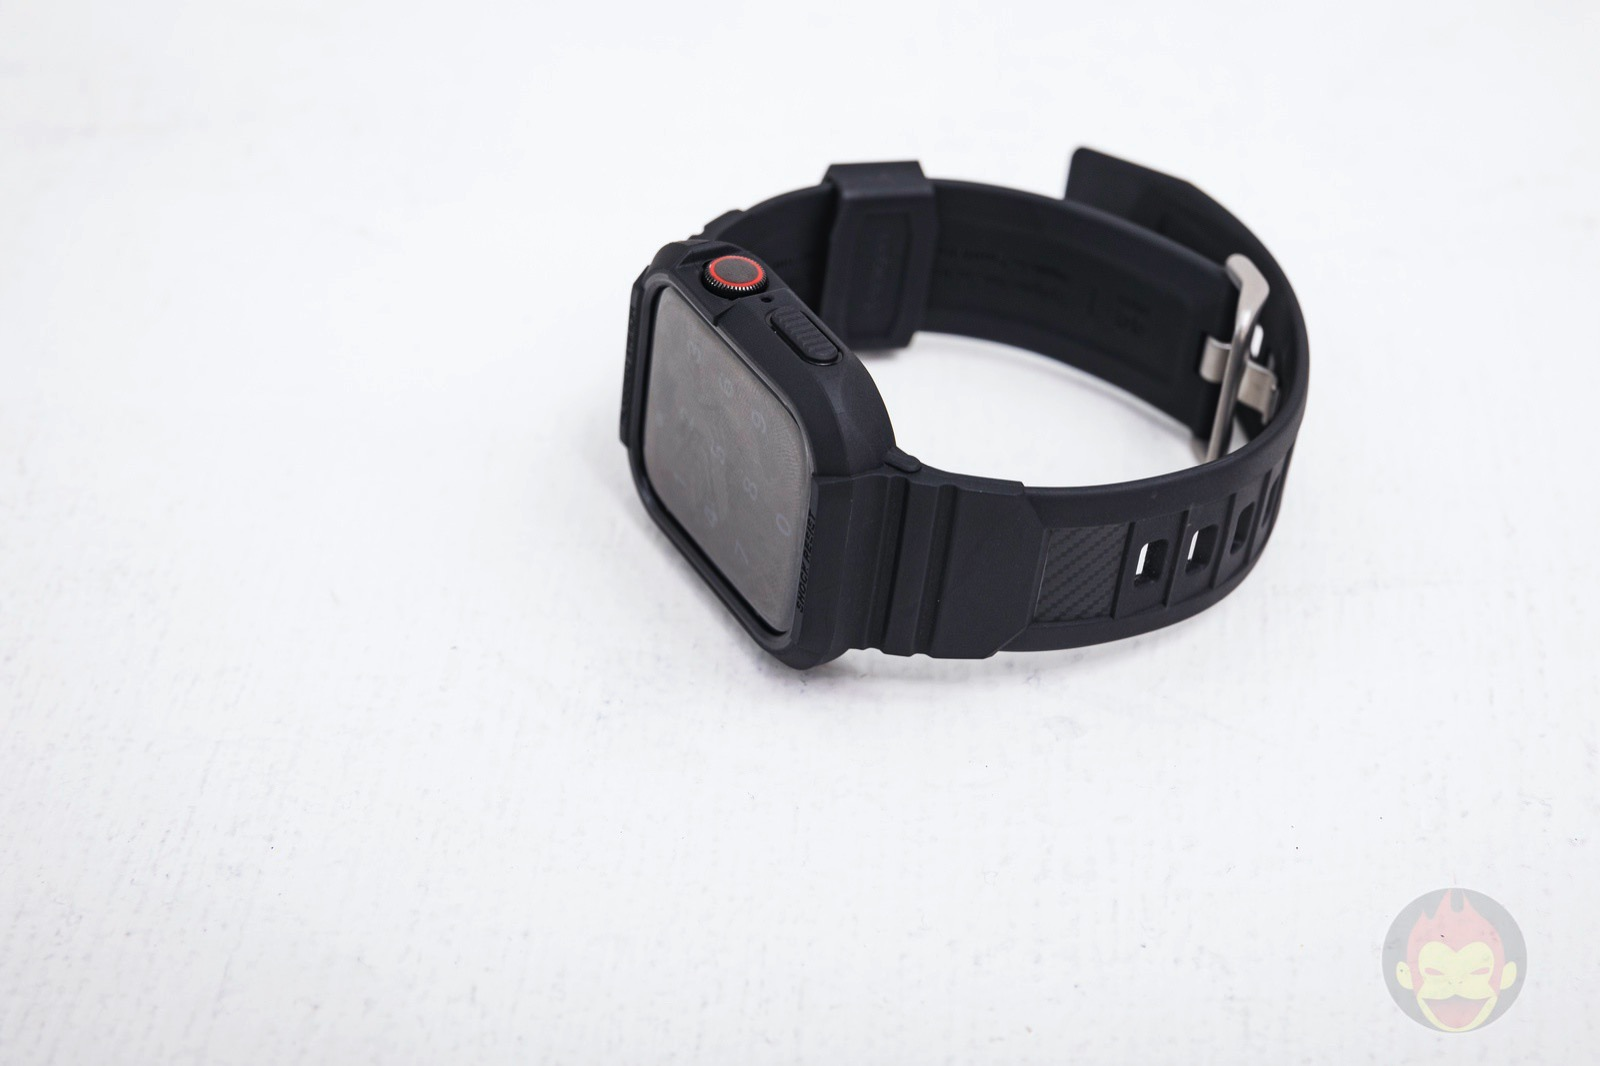 Spigen-Rugged-Armor-Pro-Apple-Watch-Band-and-case-05.jpg